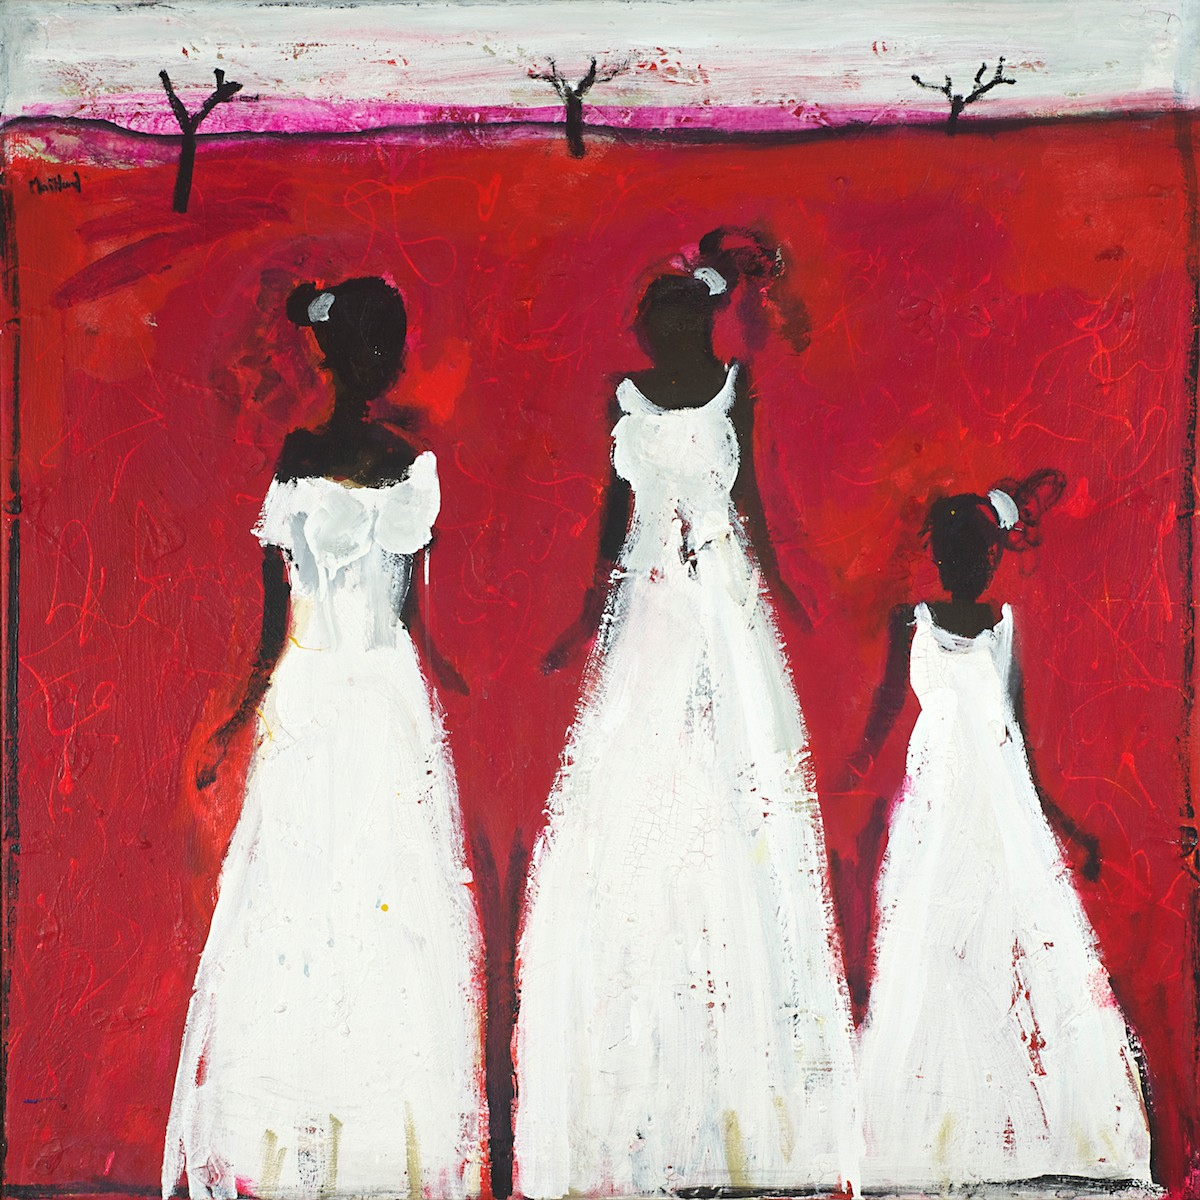 #13474 John Maitland 'Three Girls in White' 105cm x 105cm